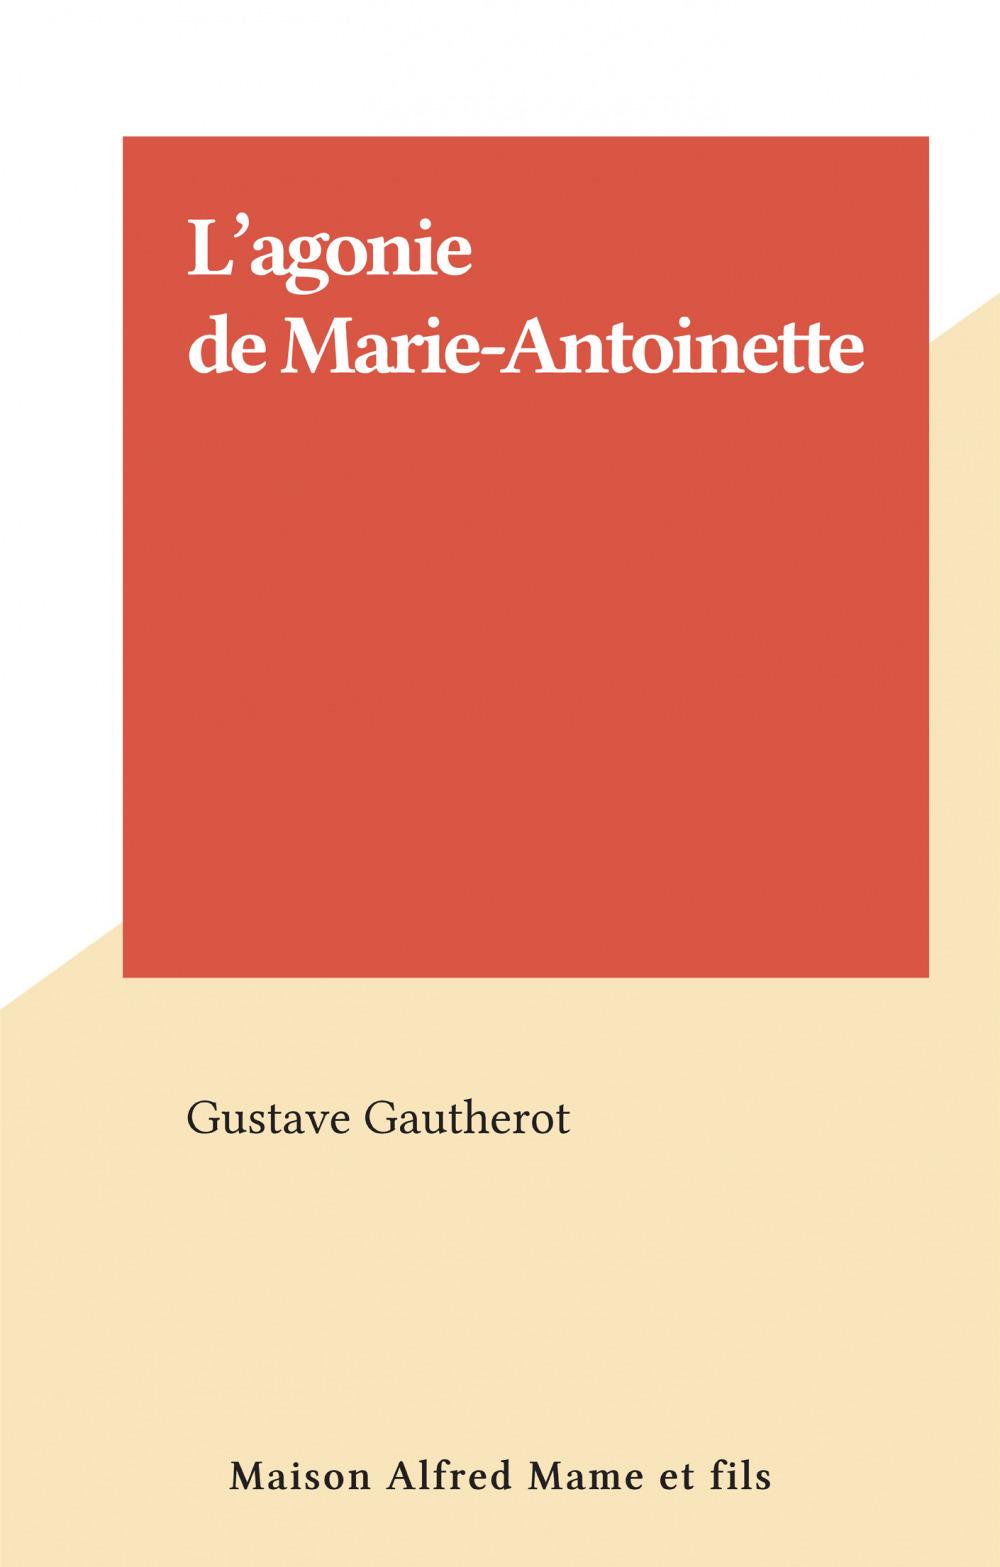 L'agonie de Marie-Antoinette